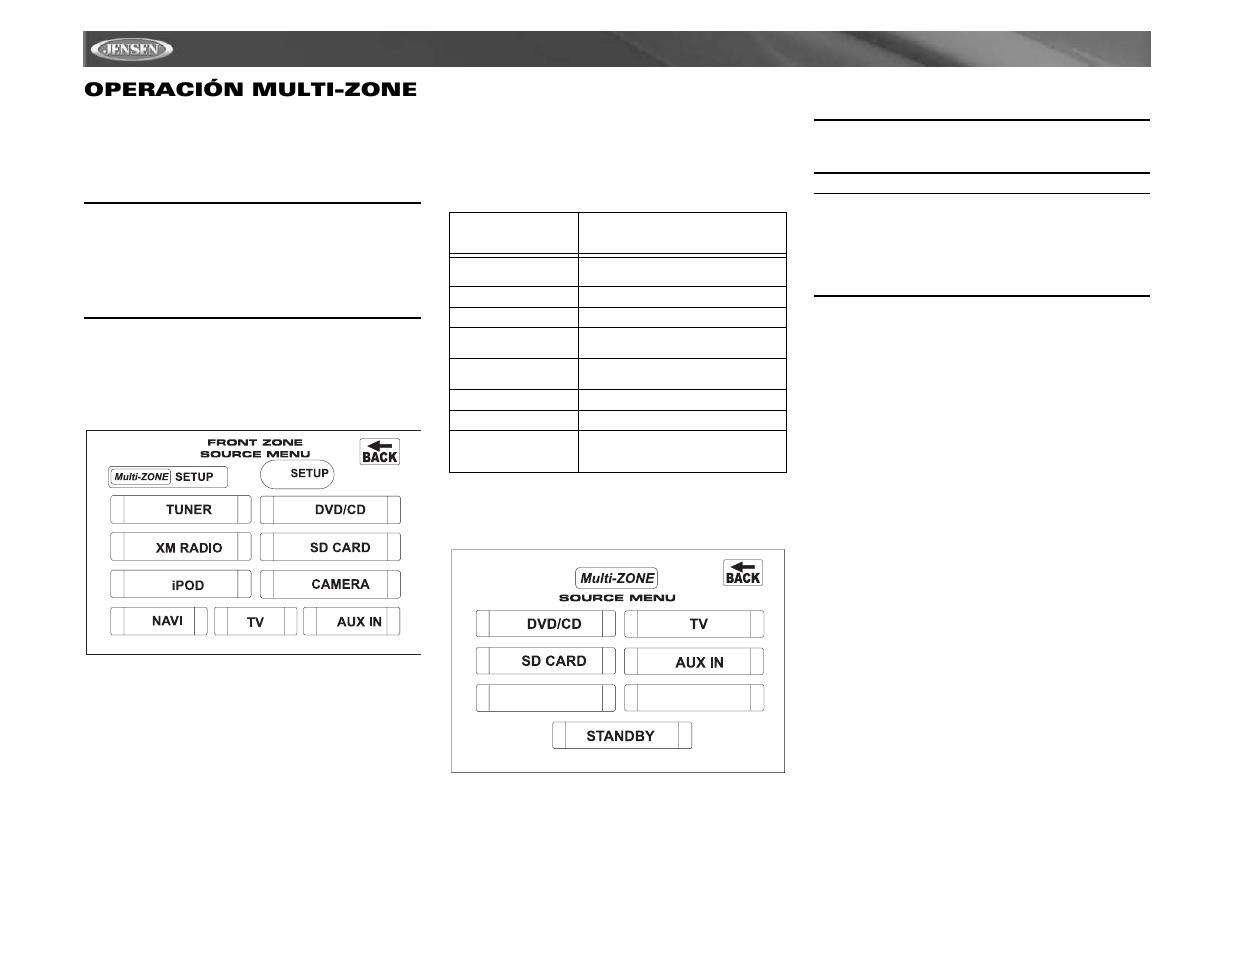 vm9021ts operaci n multi zone jensen mobile multimedia am fm dvd rh manualsdir com Manuals in PDF Operators Manual